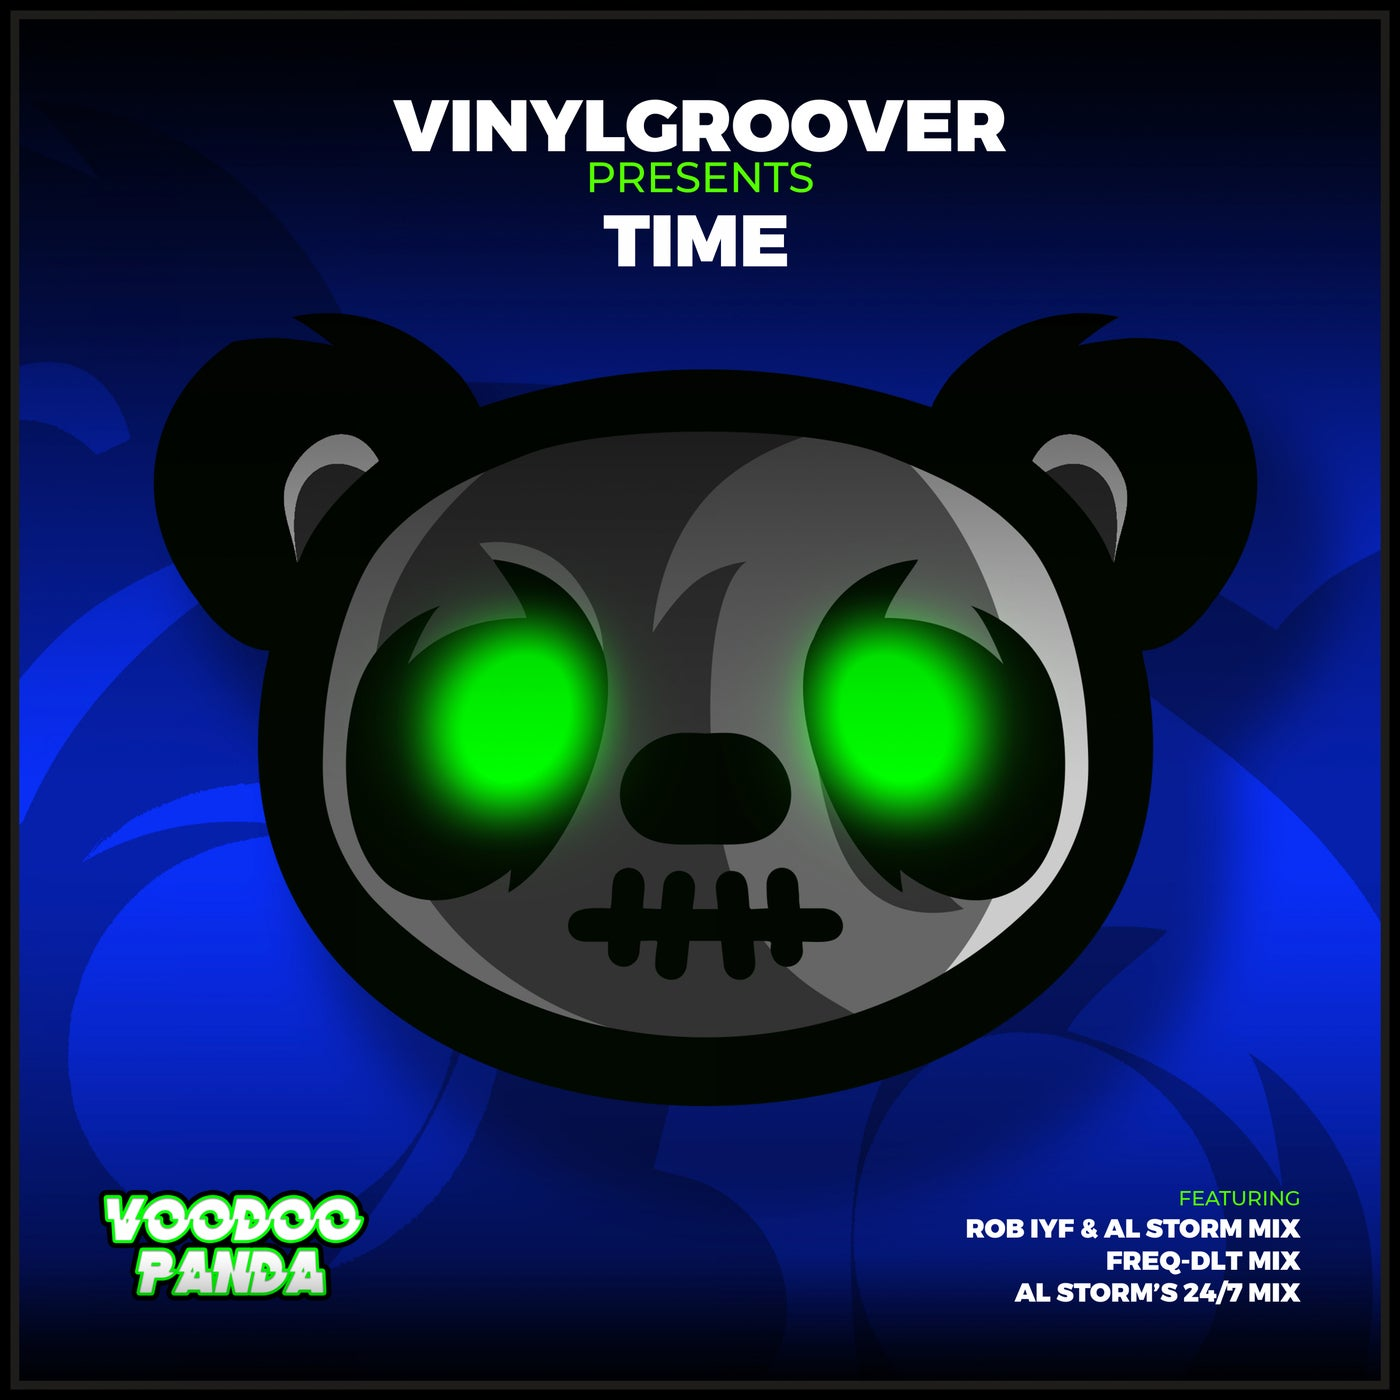 Time (Al Storm's 24/7 Mix)